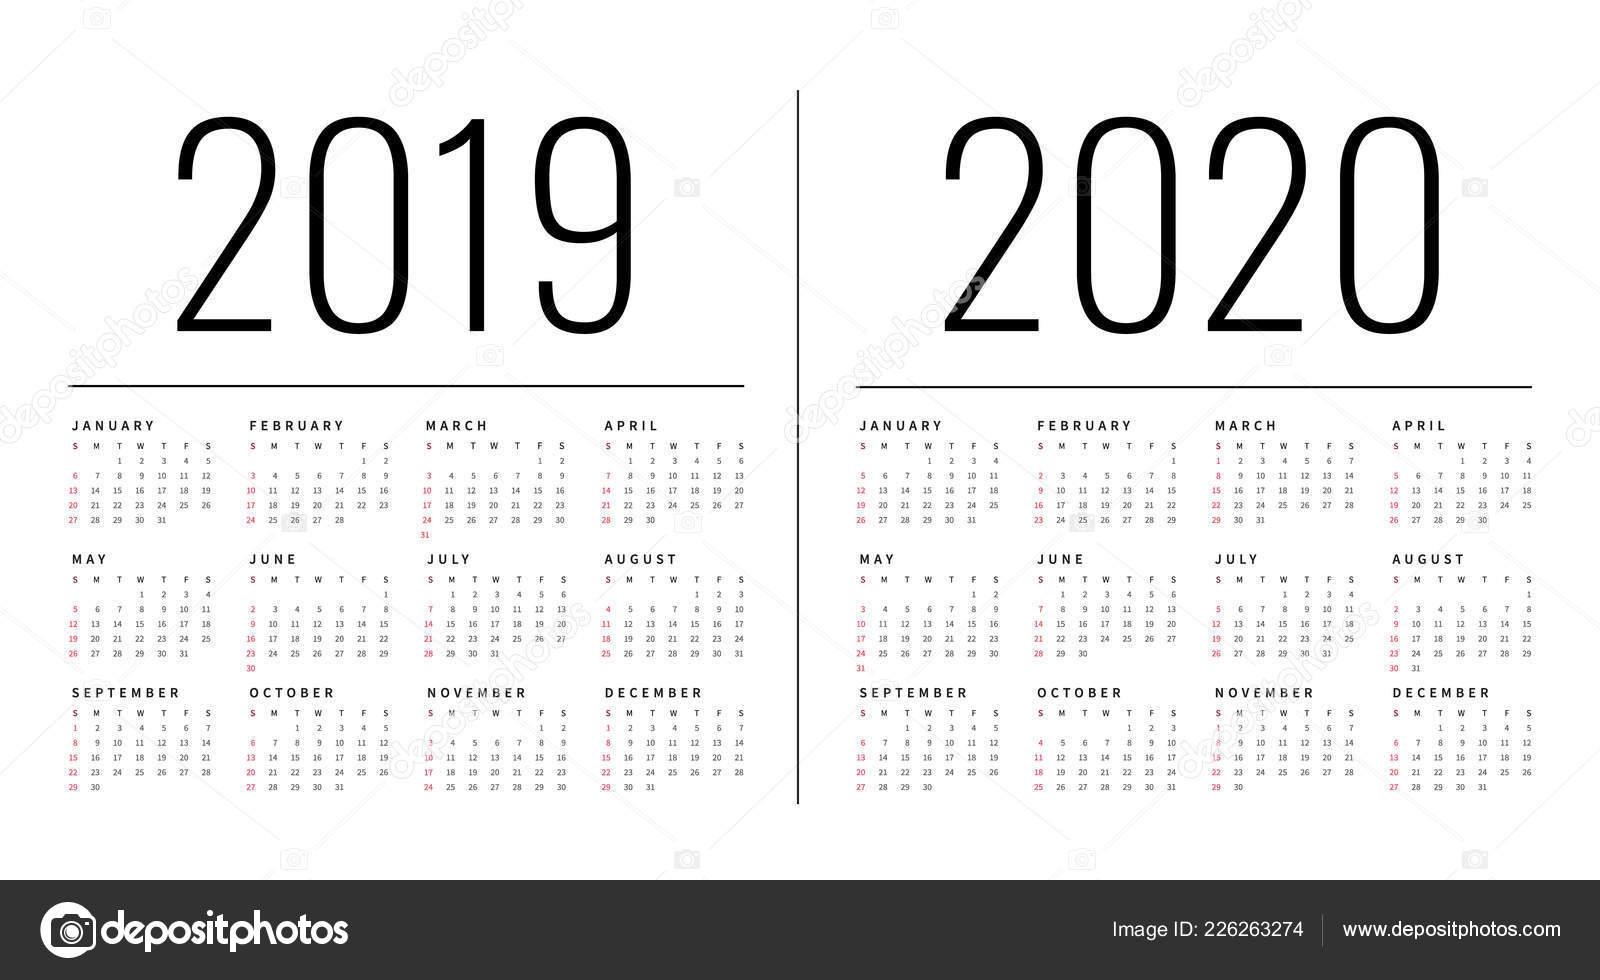 Layout Calendario 2020.Mockup Simple Calendar Layout 2019 2020 Years Week Starts